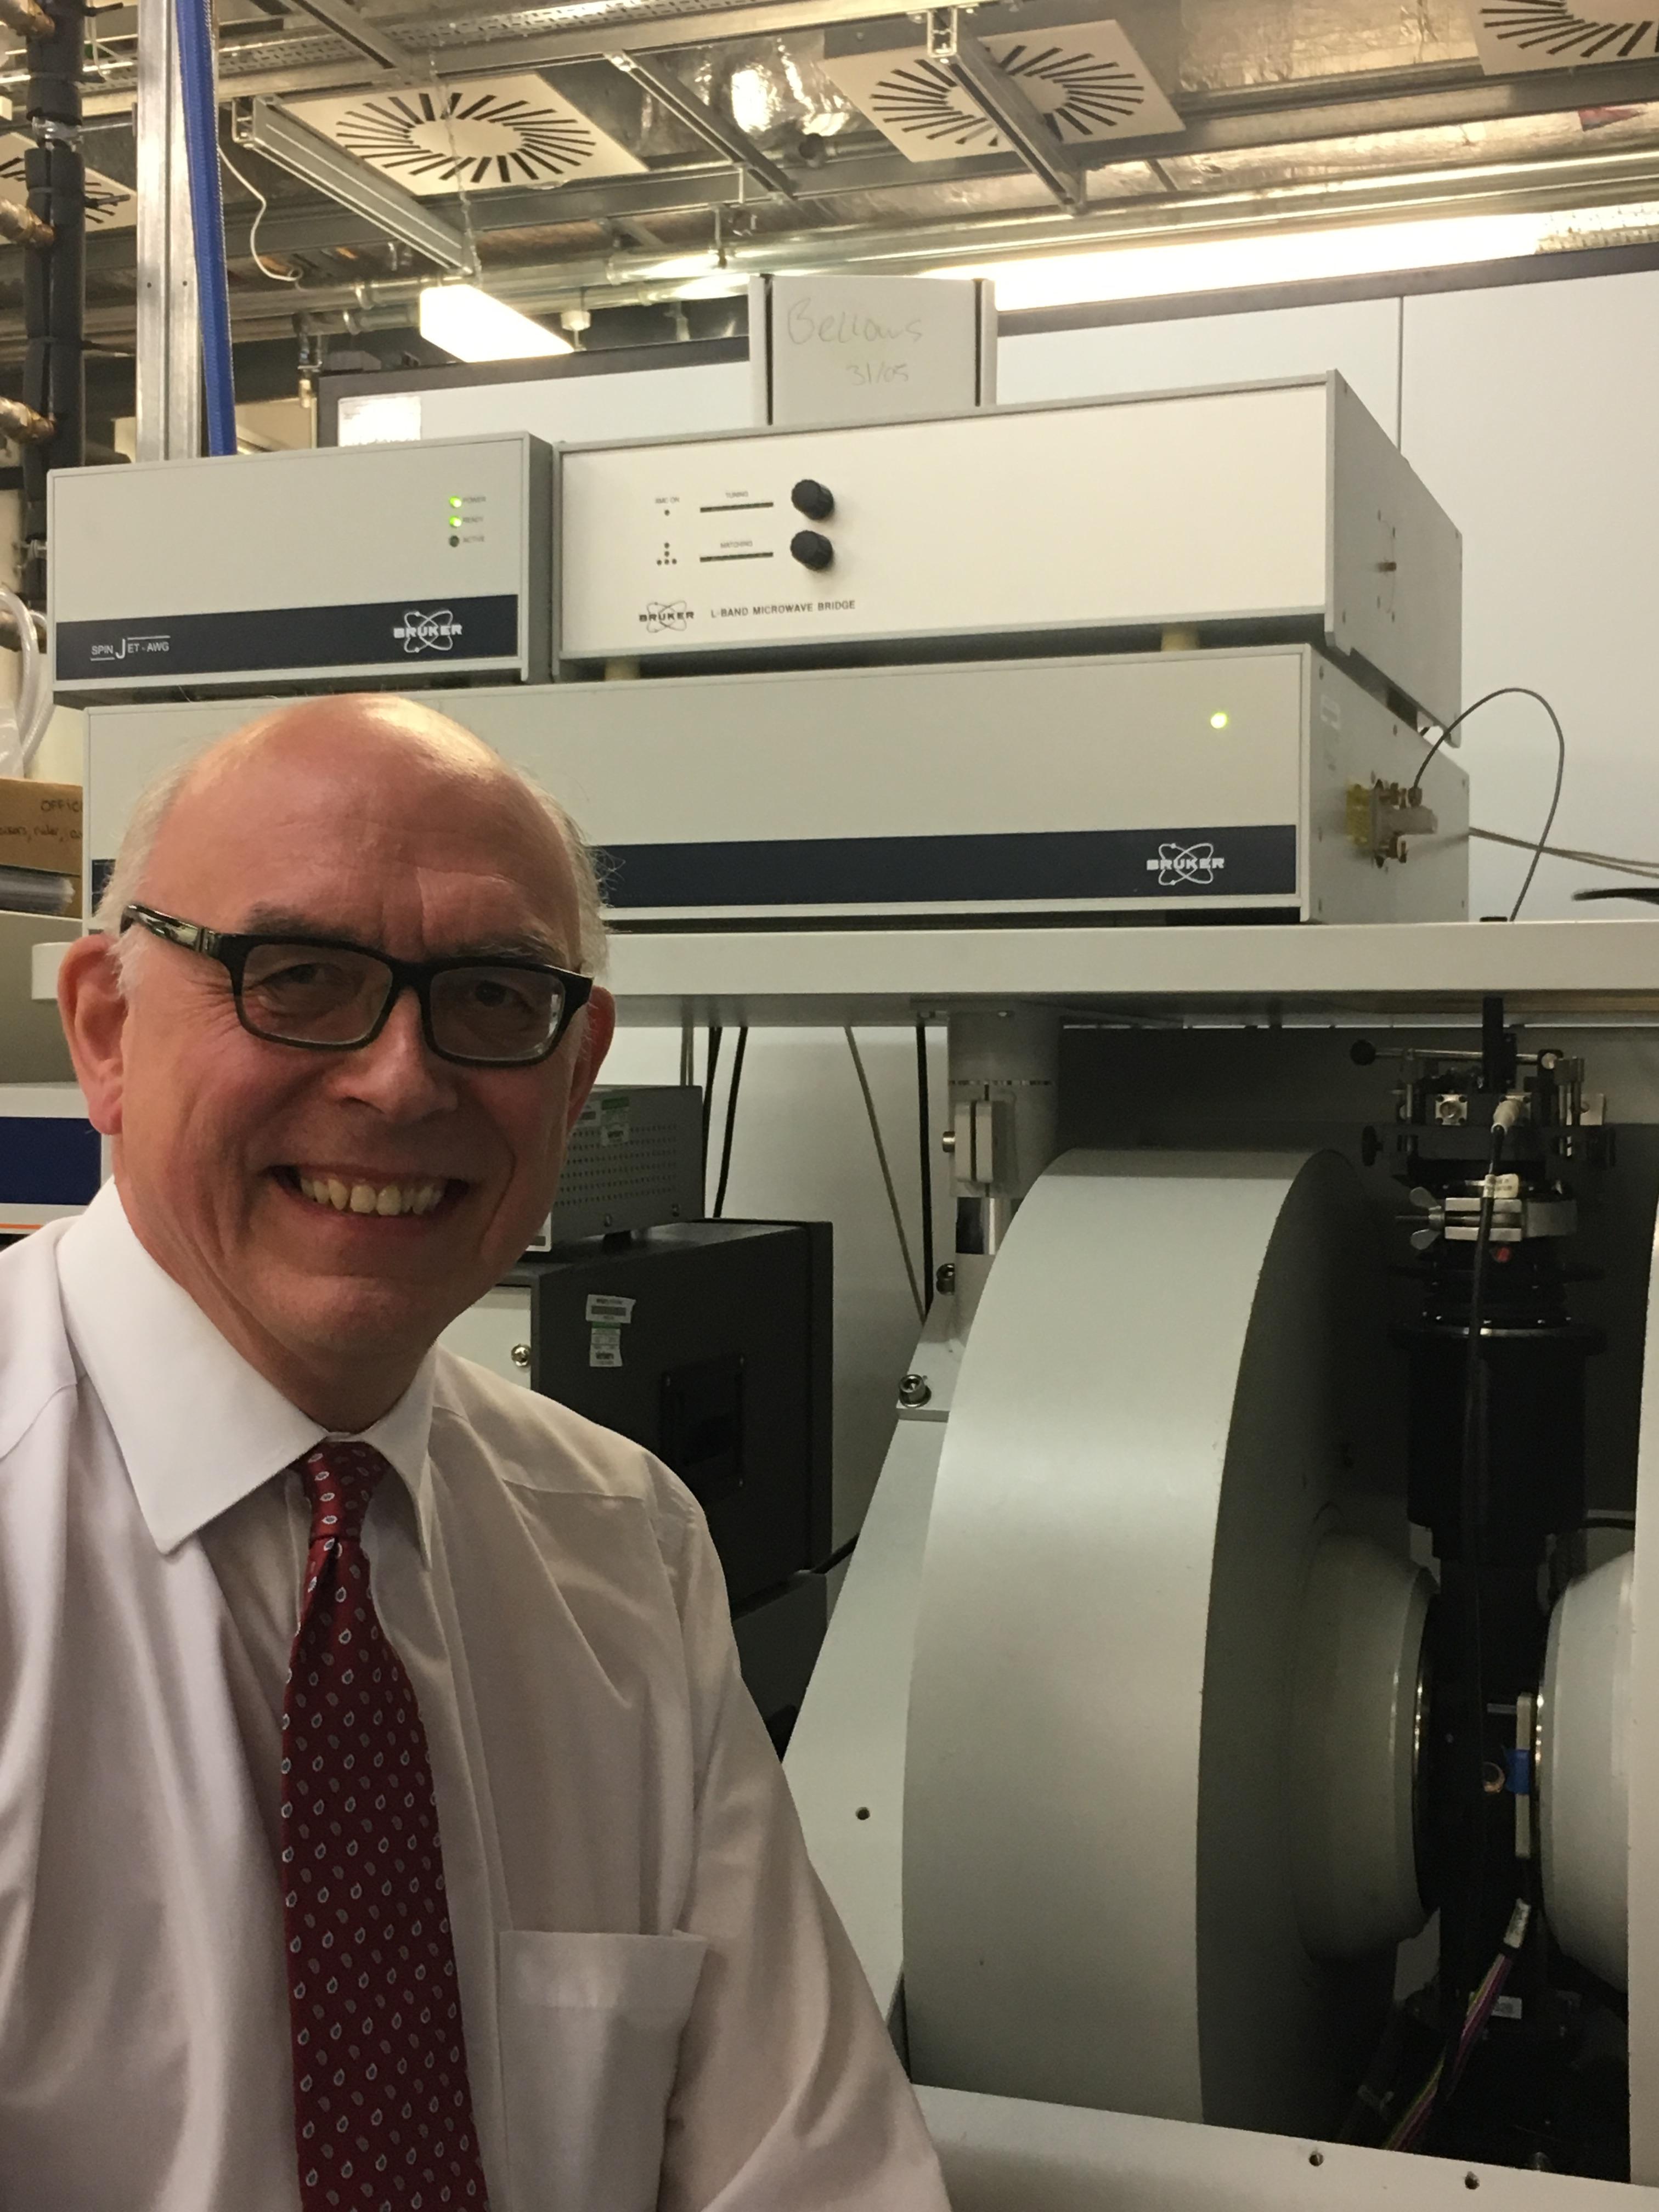 Portrait photo of Prof. David Collison with EPR spectrometer